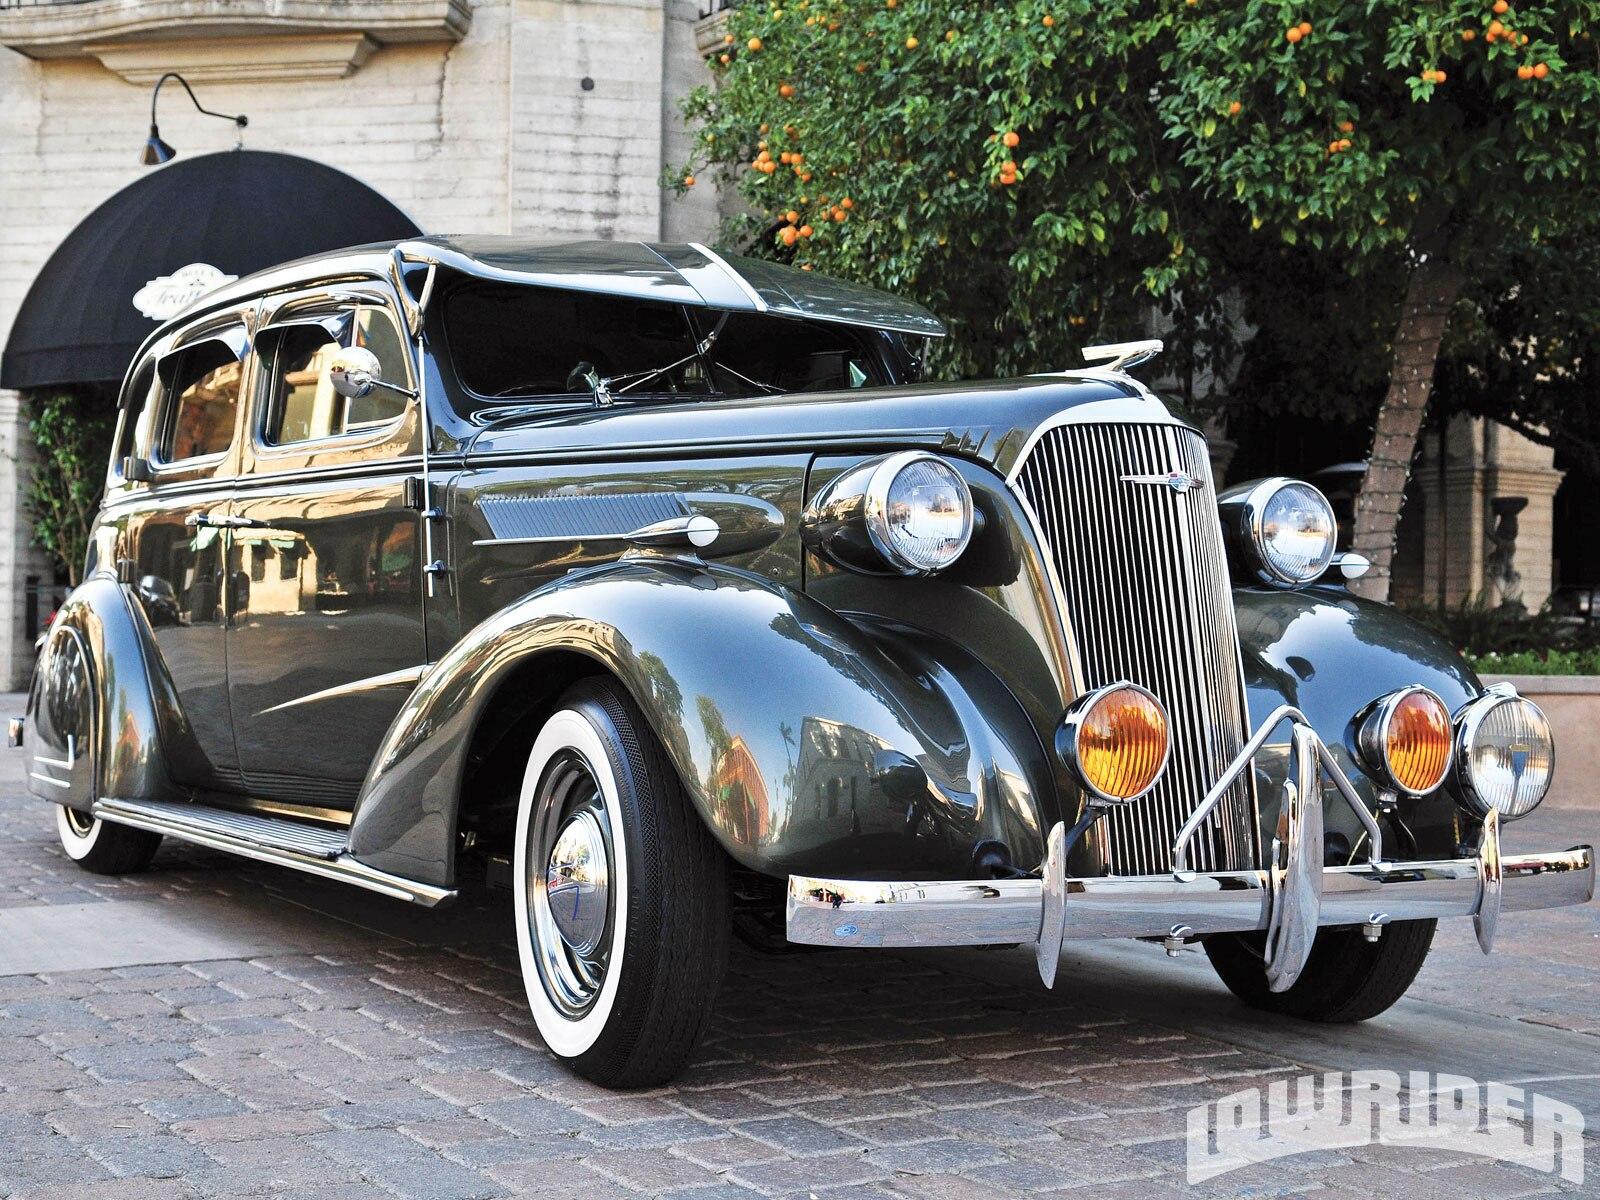 1937 Chevrolet Righthand Drive - Original Gangster - Lowrider Magazine